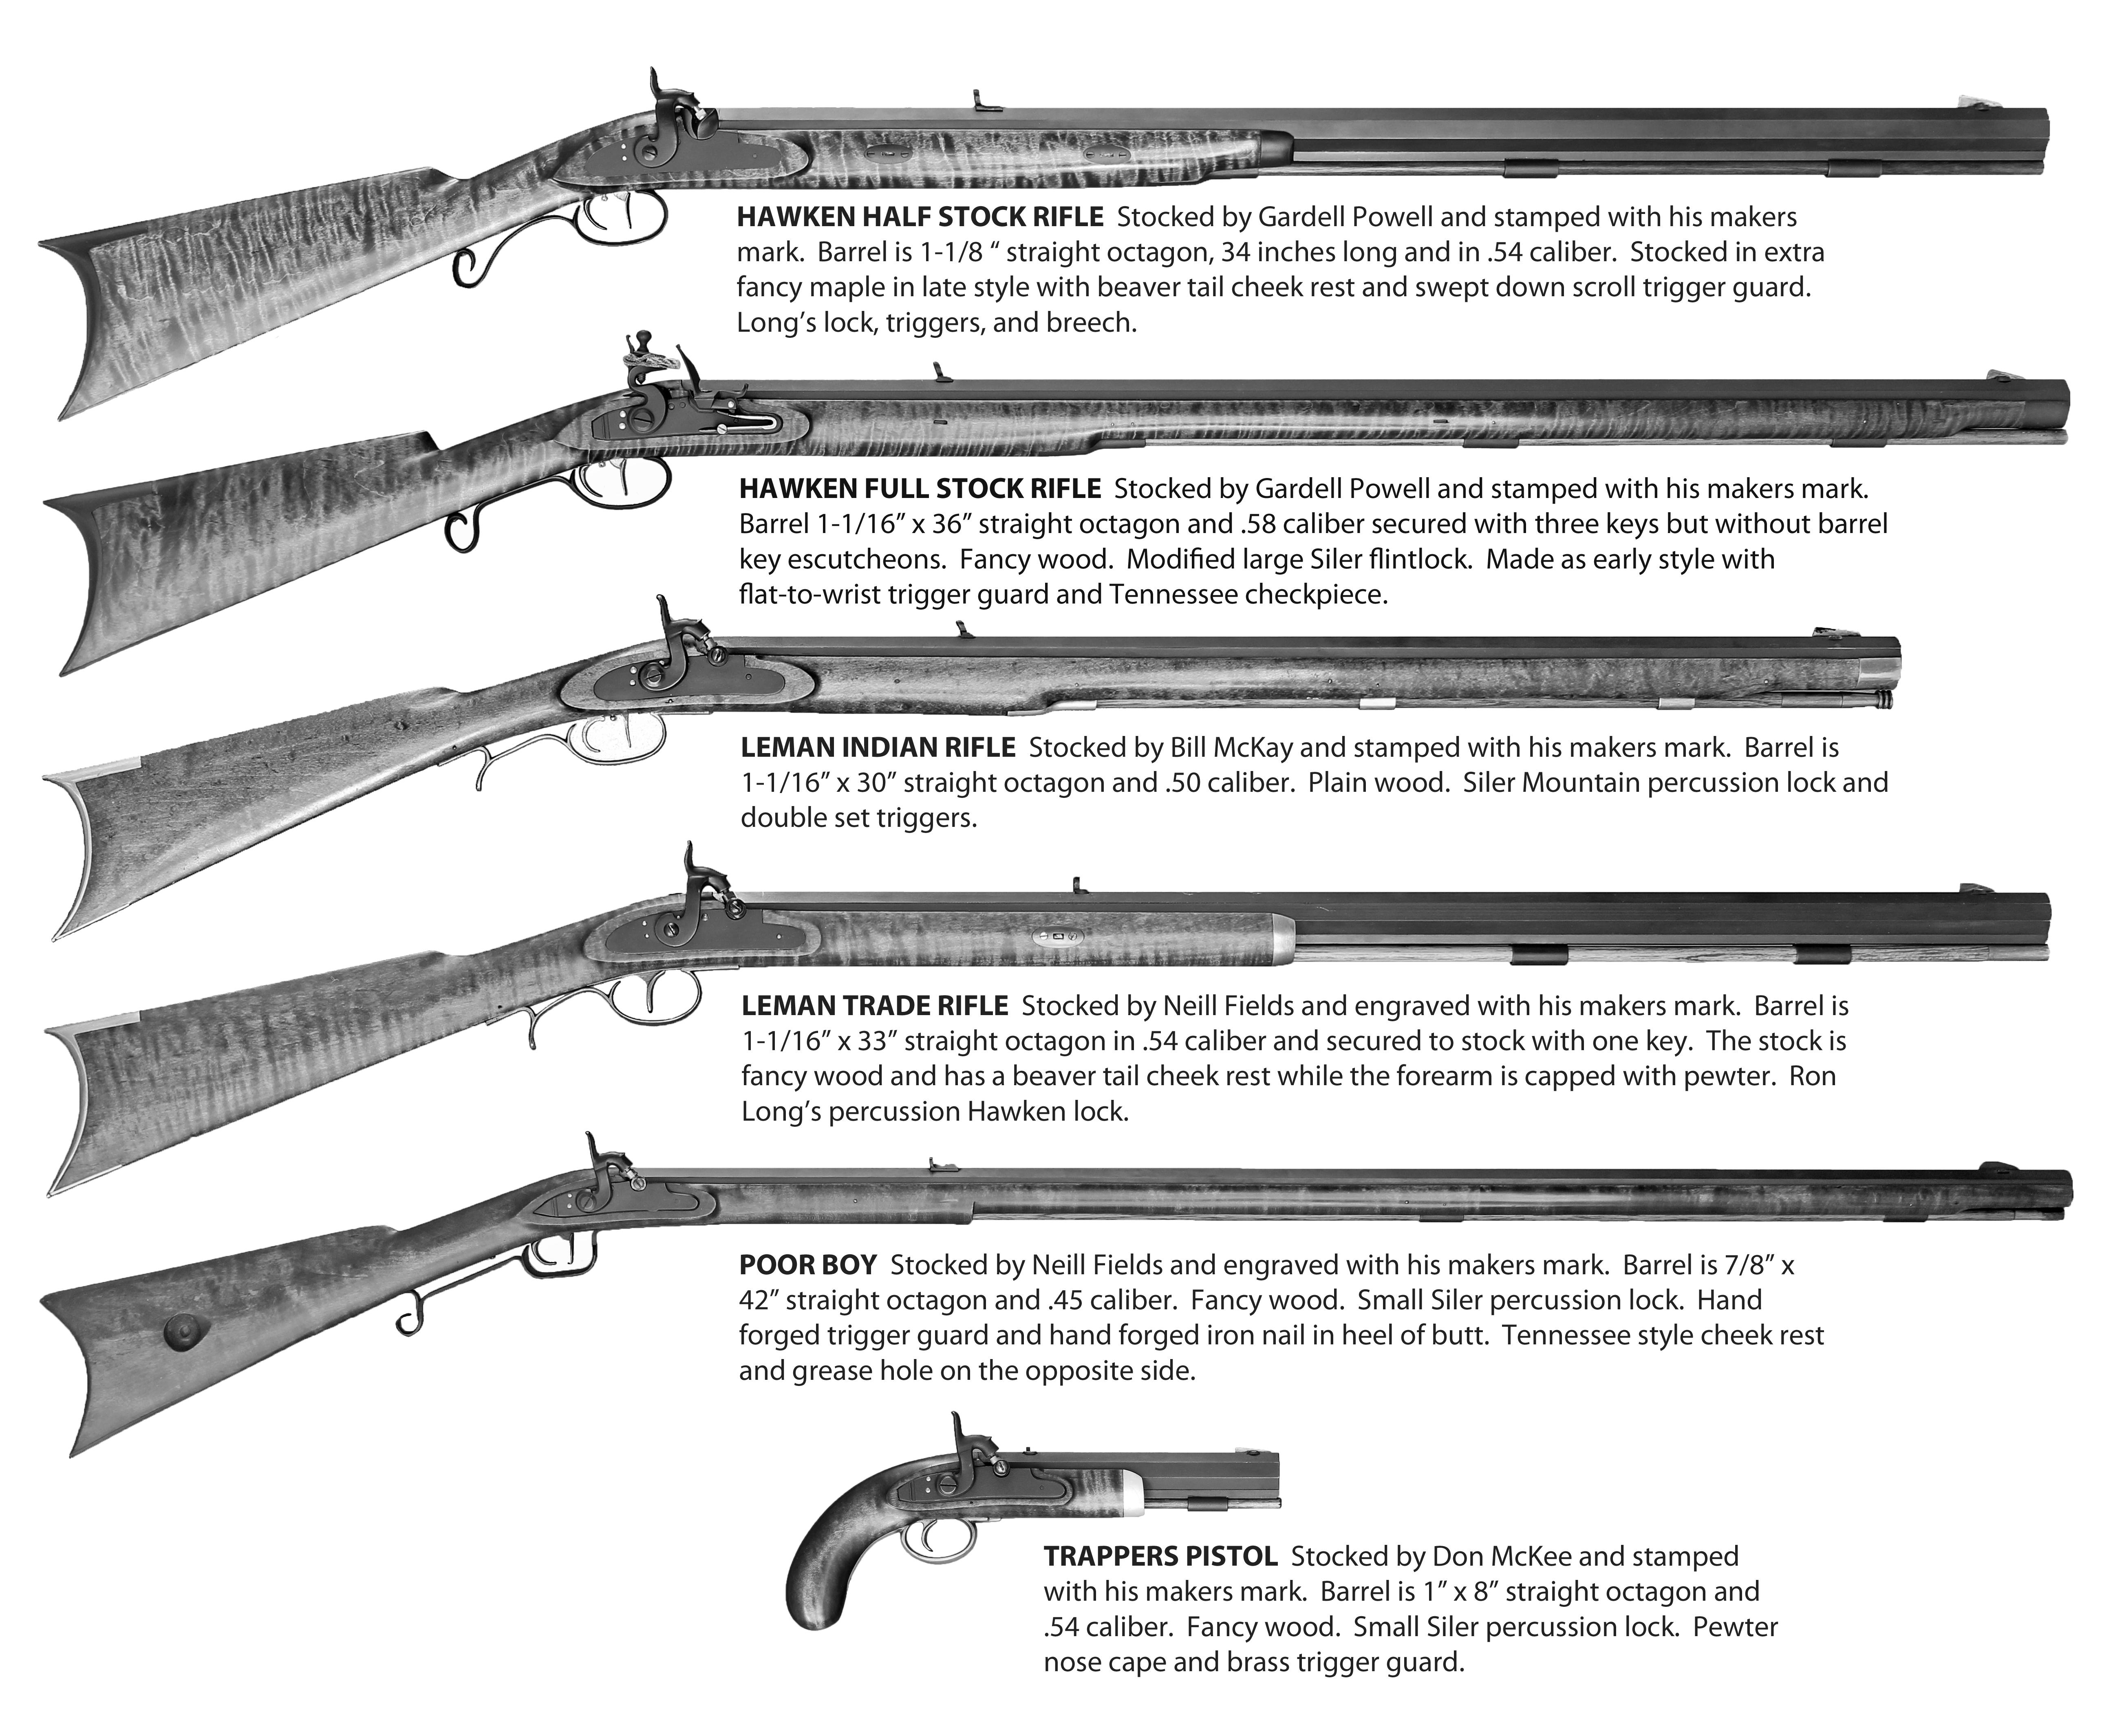 Basic GRRW Gun Collection – GRRW Collector